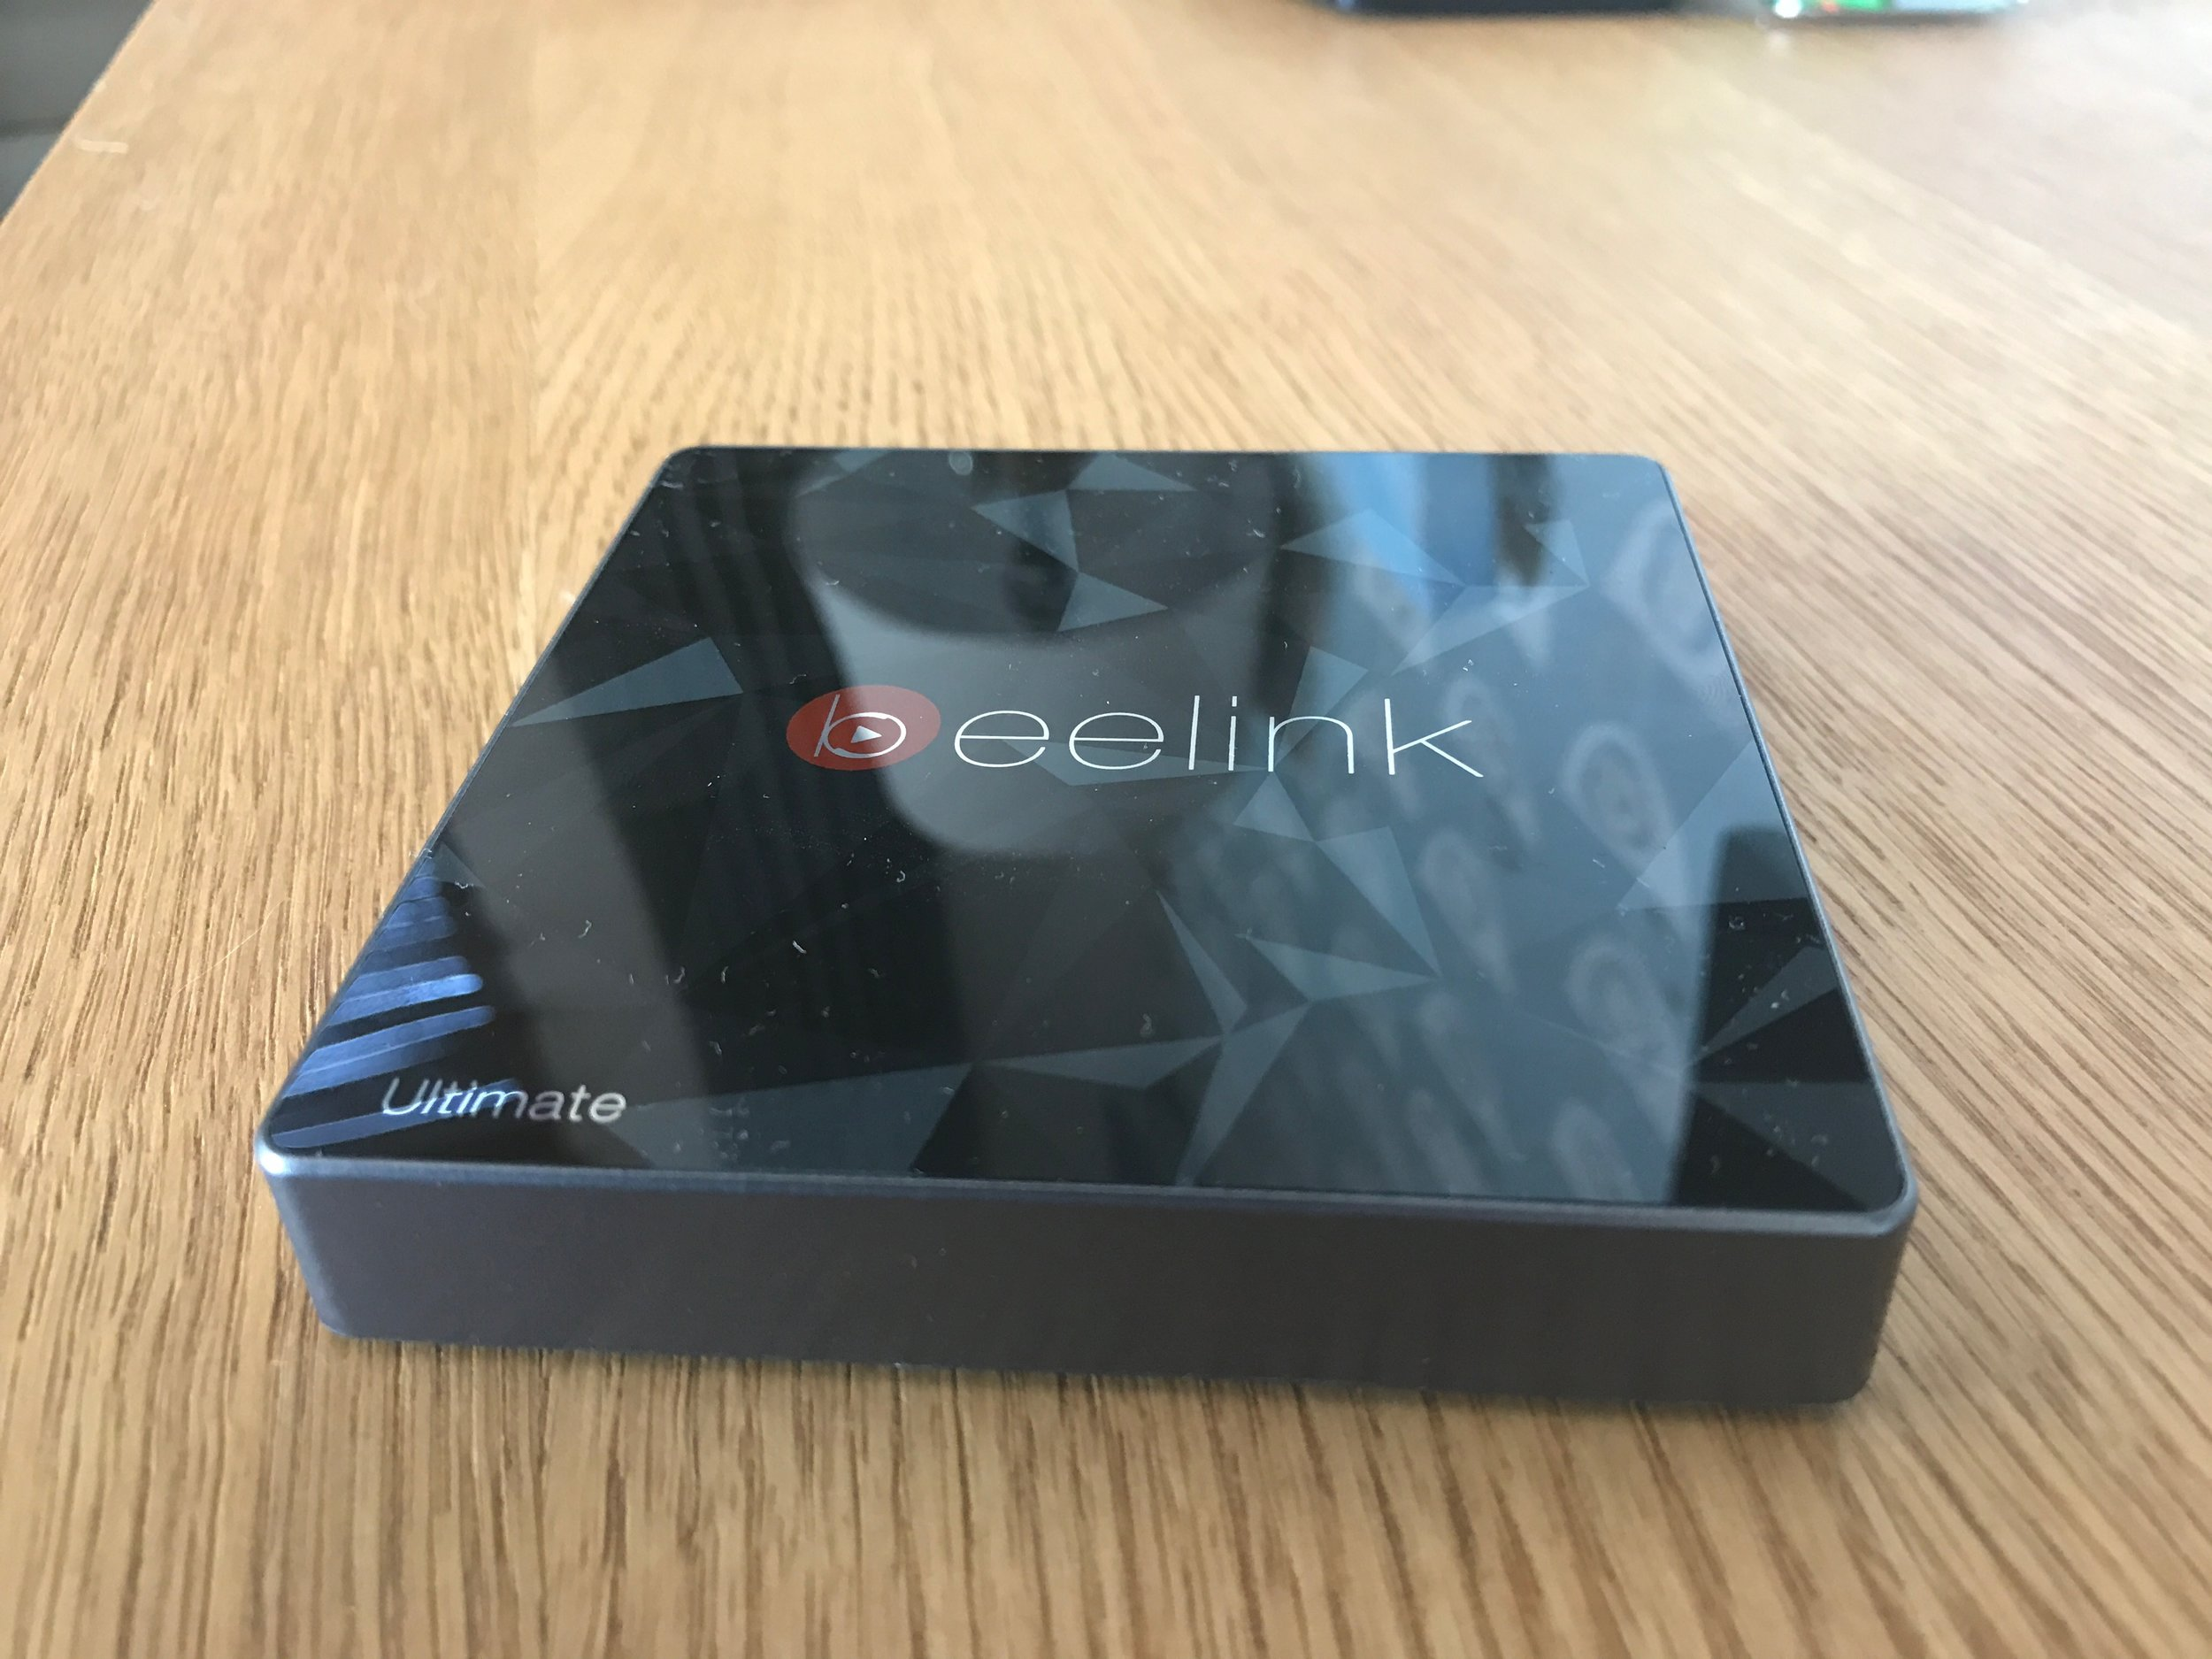 The Beelink Ultimate.